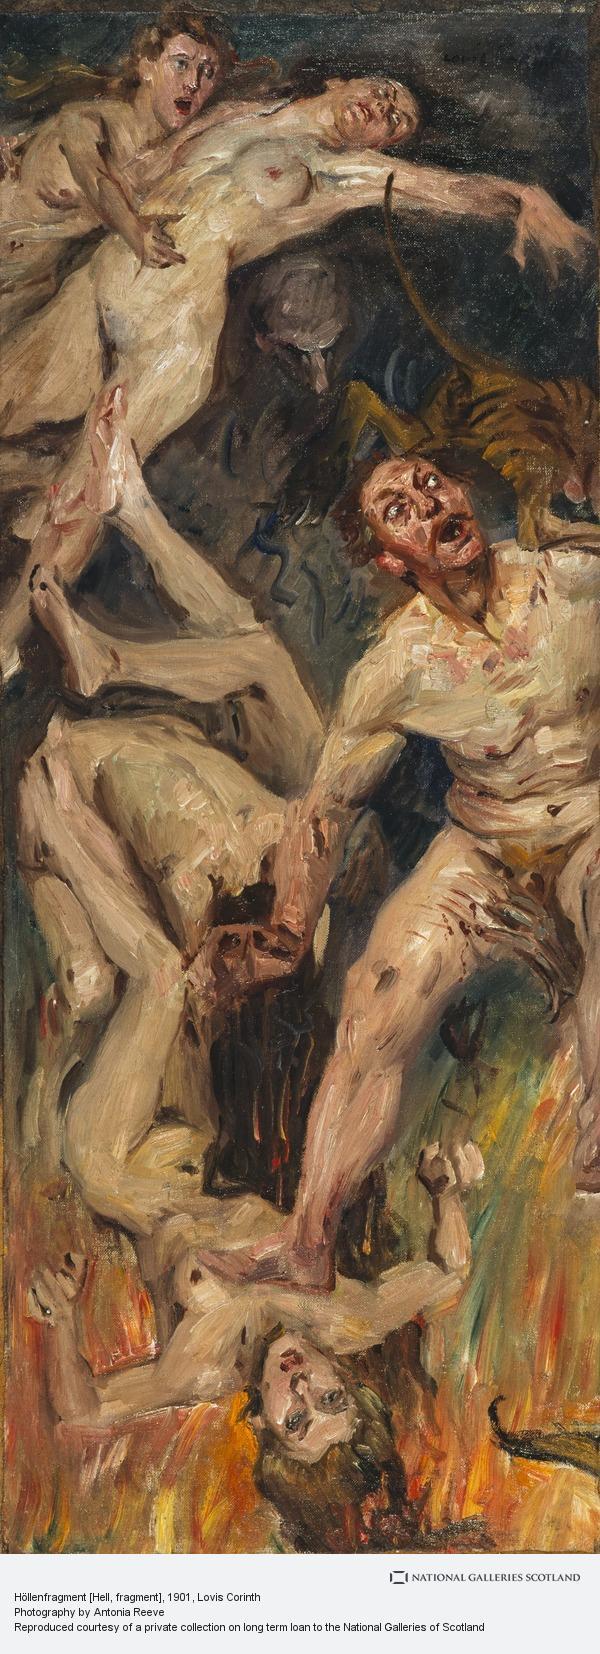 Lovis Corinth, Höllenfragment [Hell, fragment]